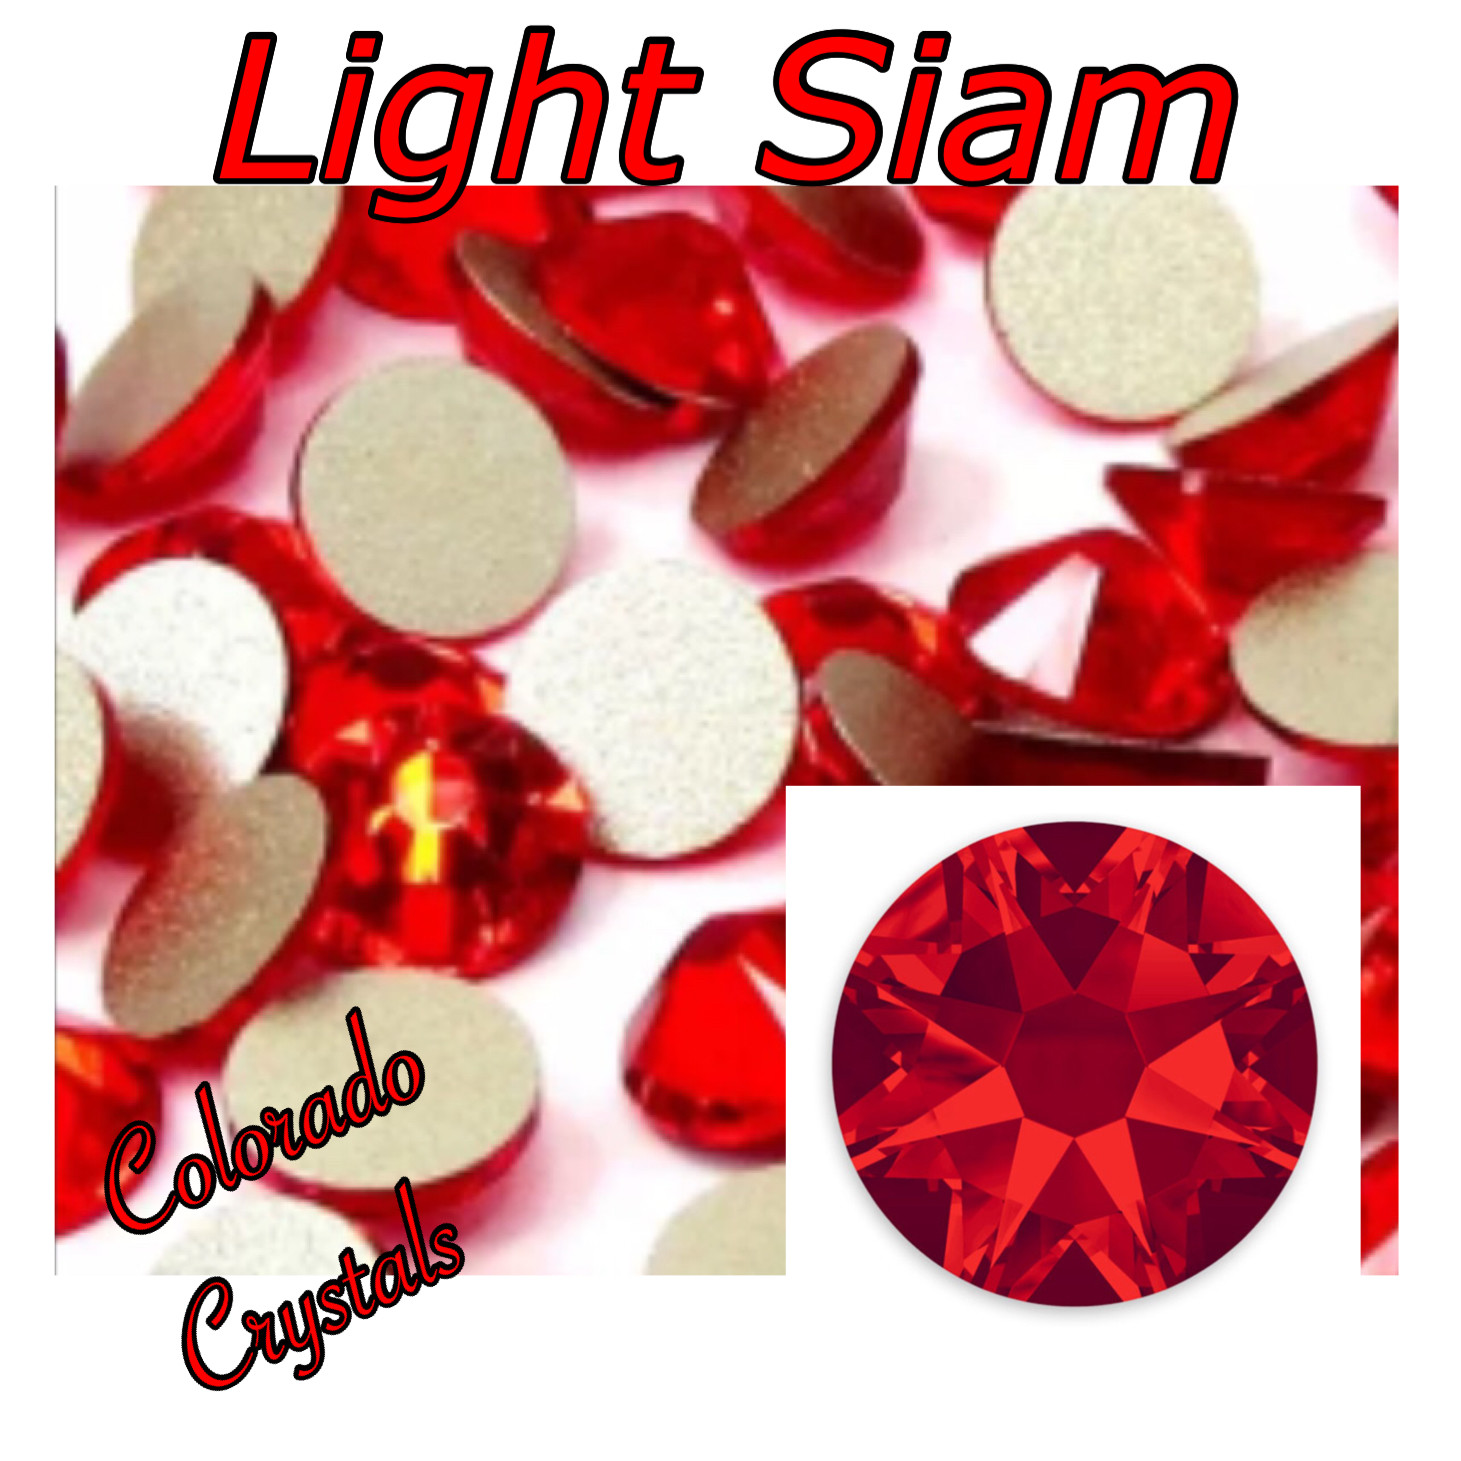 Light Siam 20ss 2088 Limited Swarovski Red Rhinestones